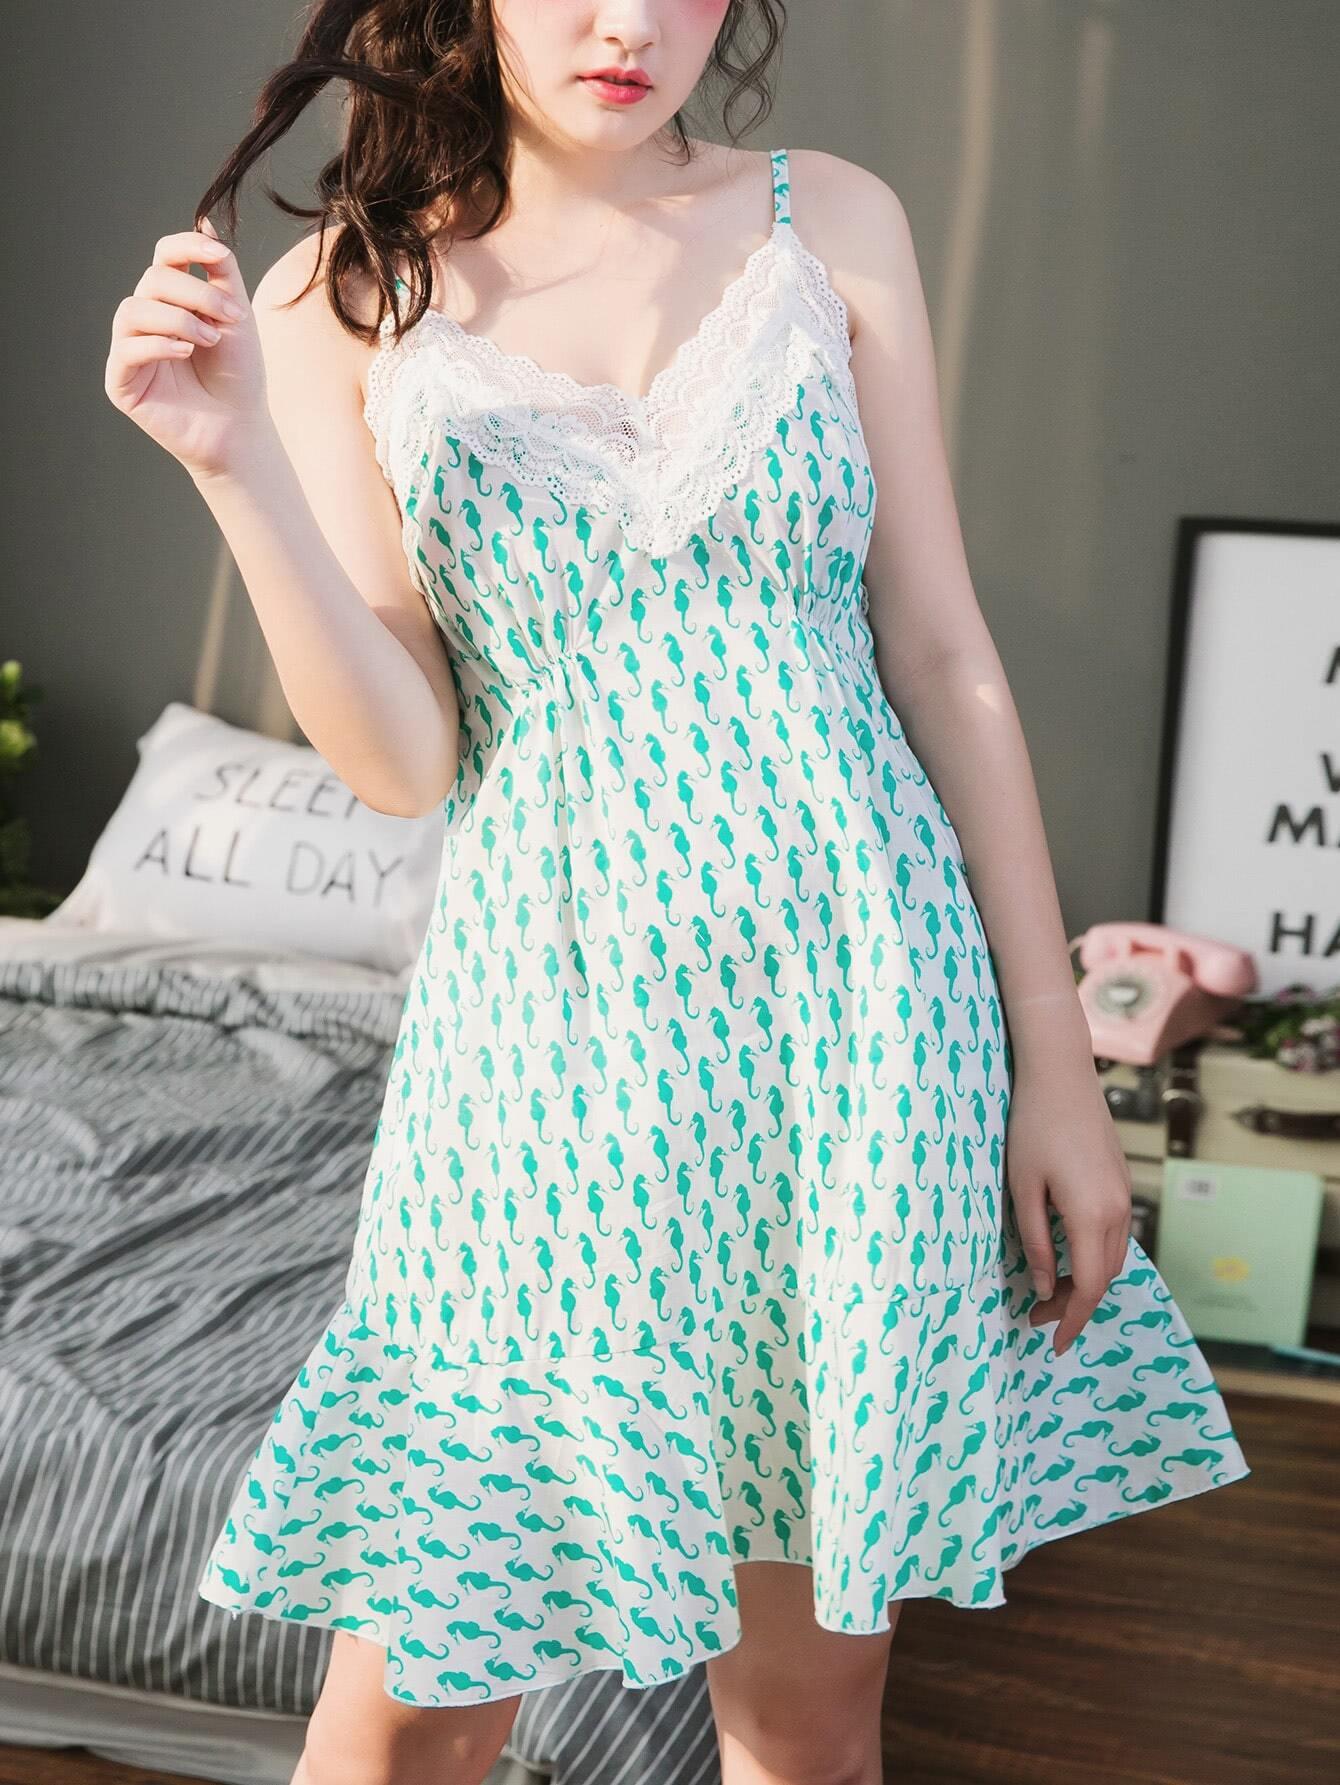 Seamless Pattern Lace Trim Frill Hem Cami Dress tiered frill trim lace up cami top